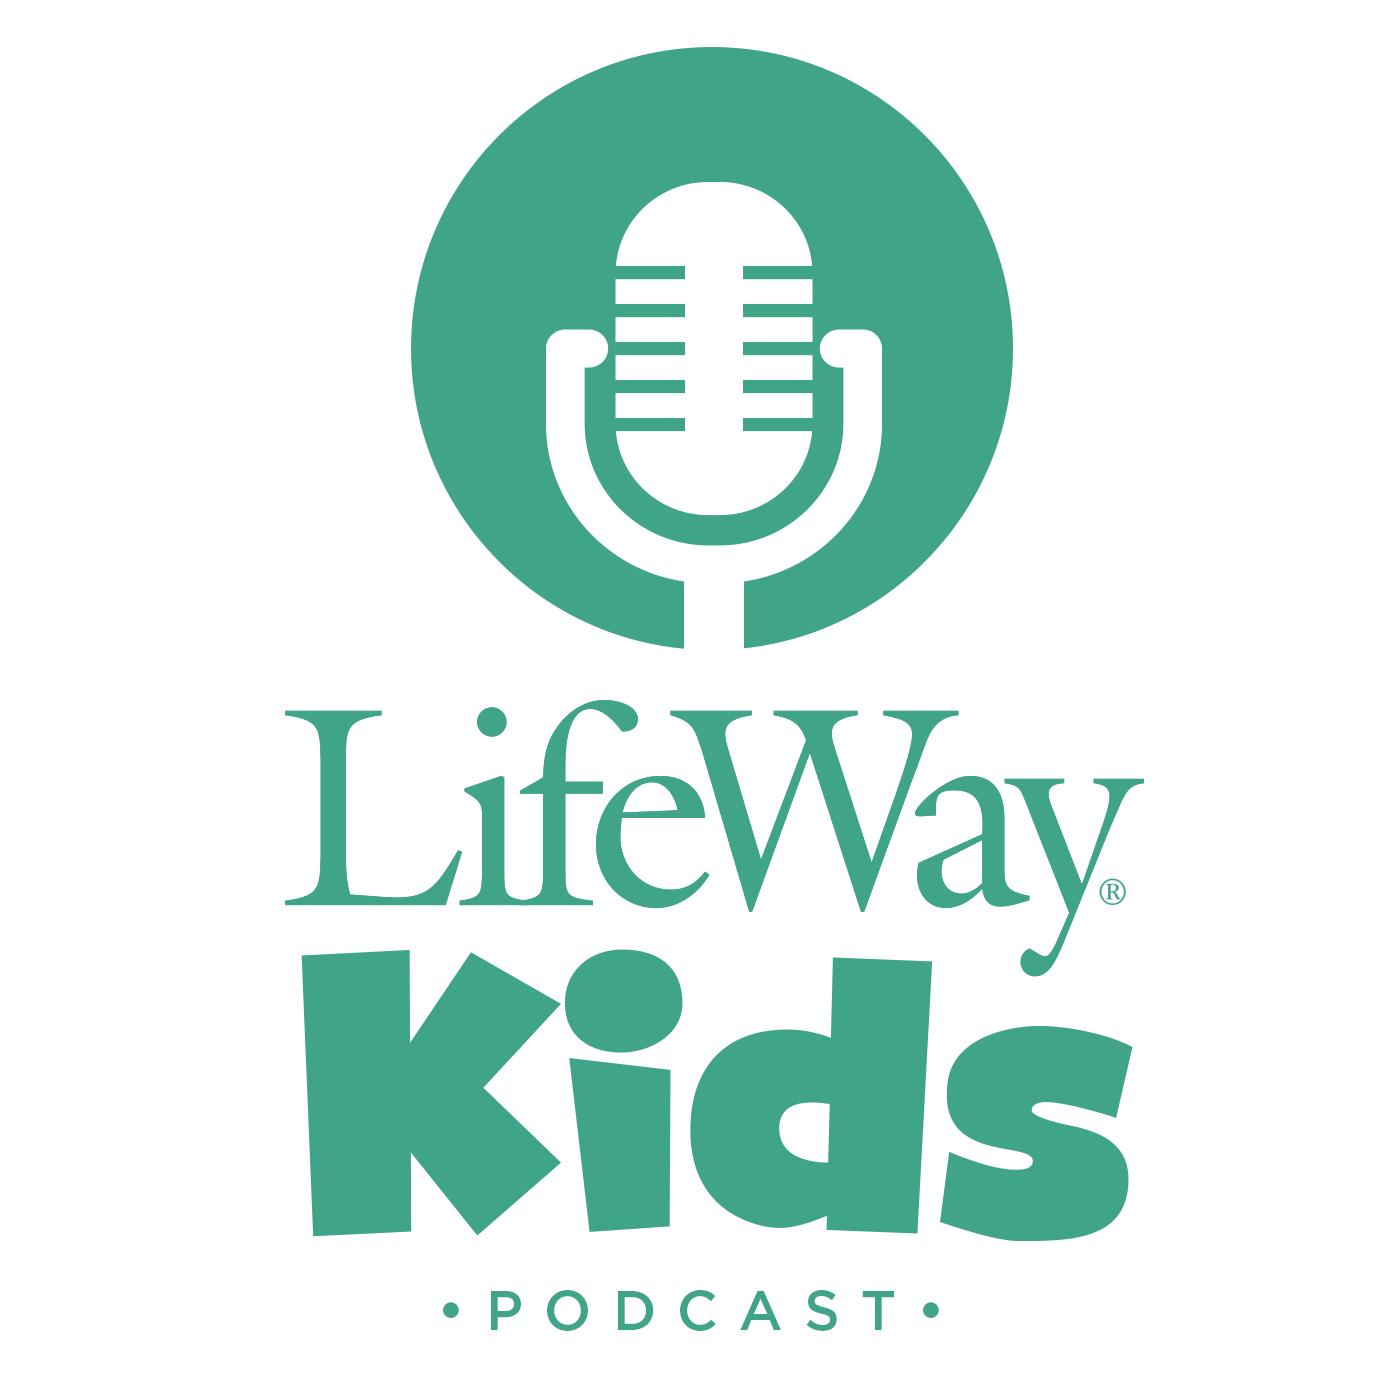 LifeWay Kids Podcast